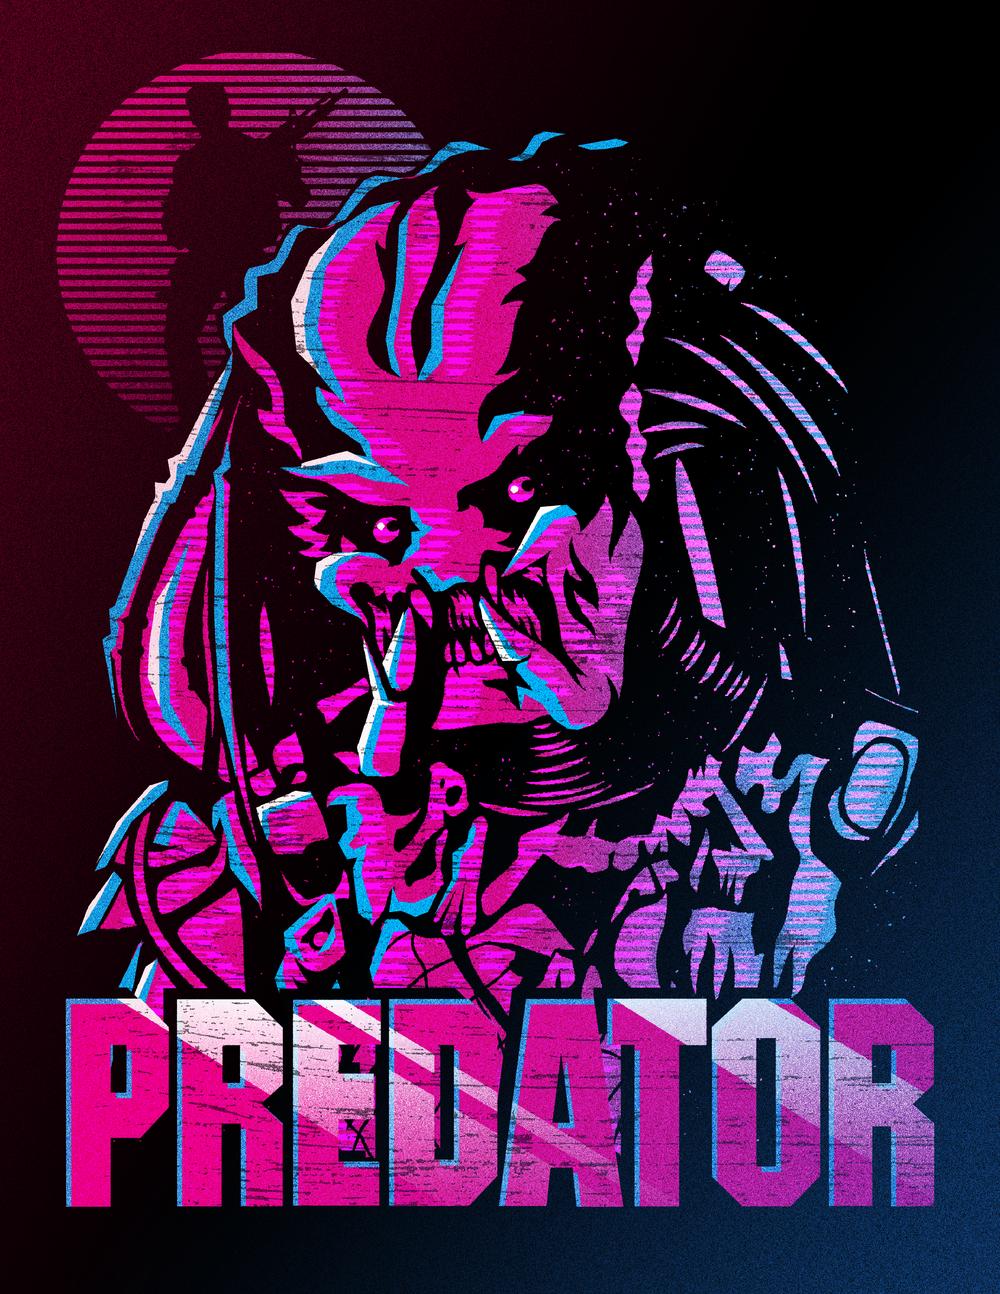 Predator_GR2.png